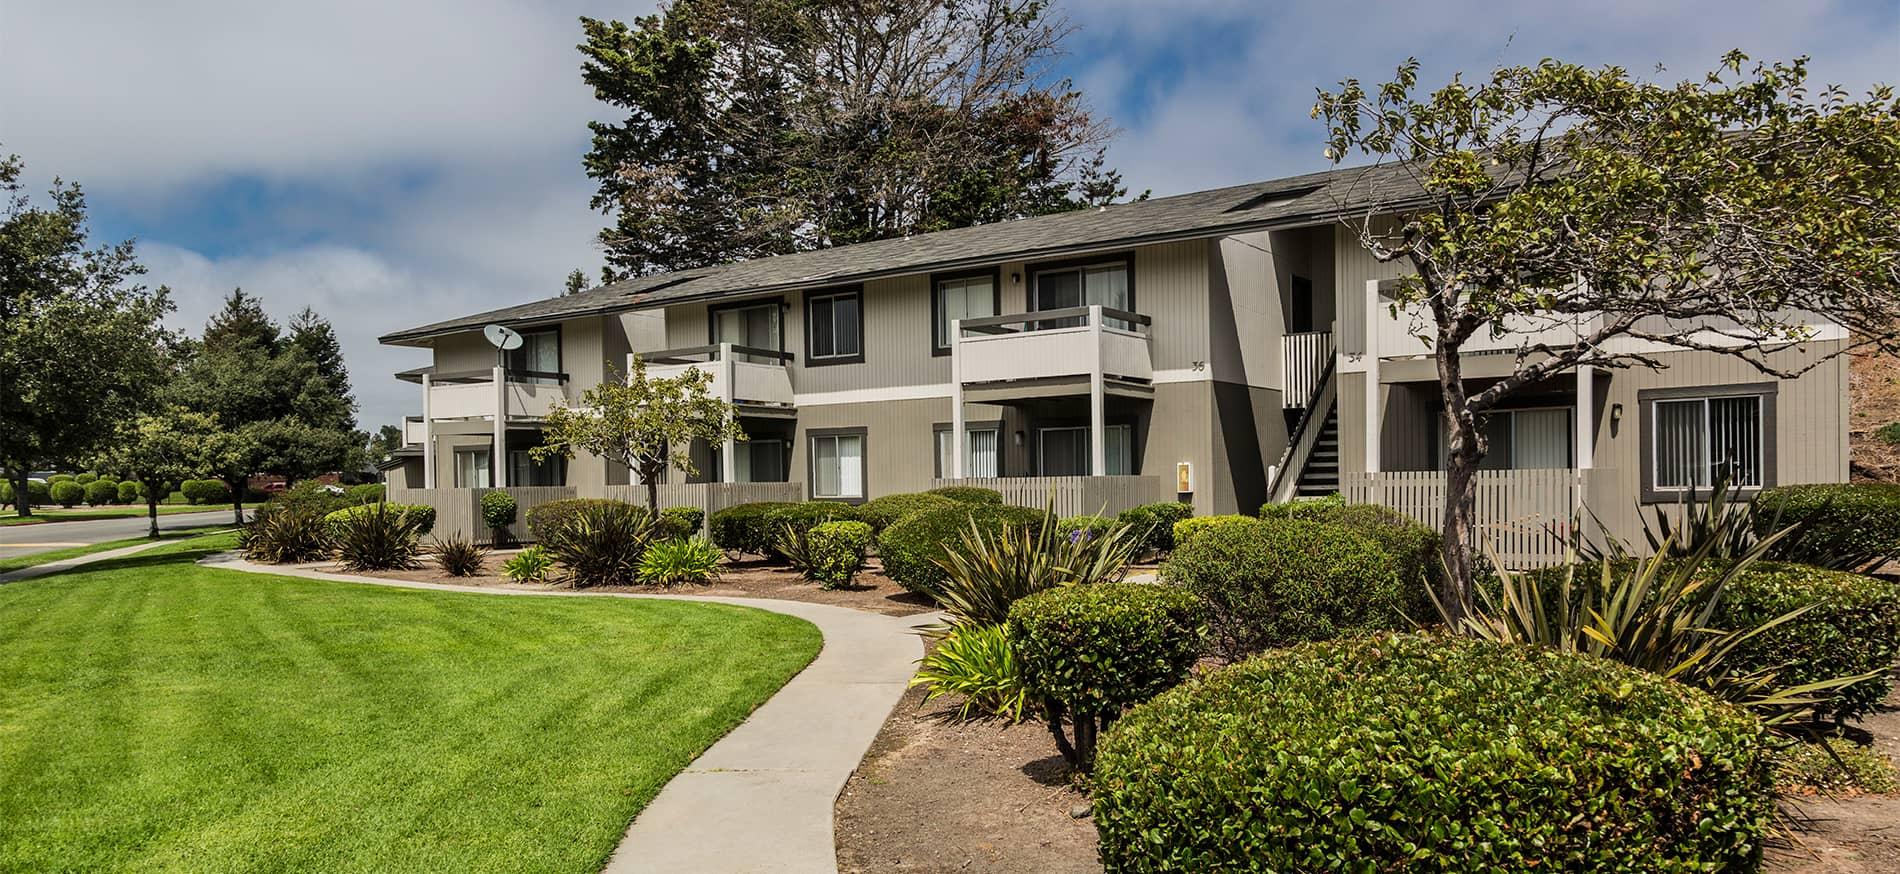 Cambridge Court Apartments in North Salinas CA